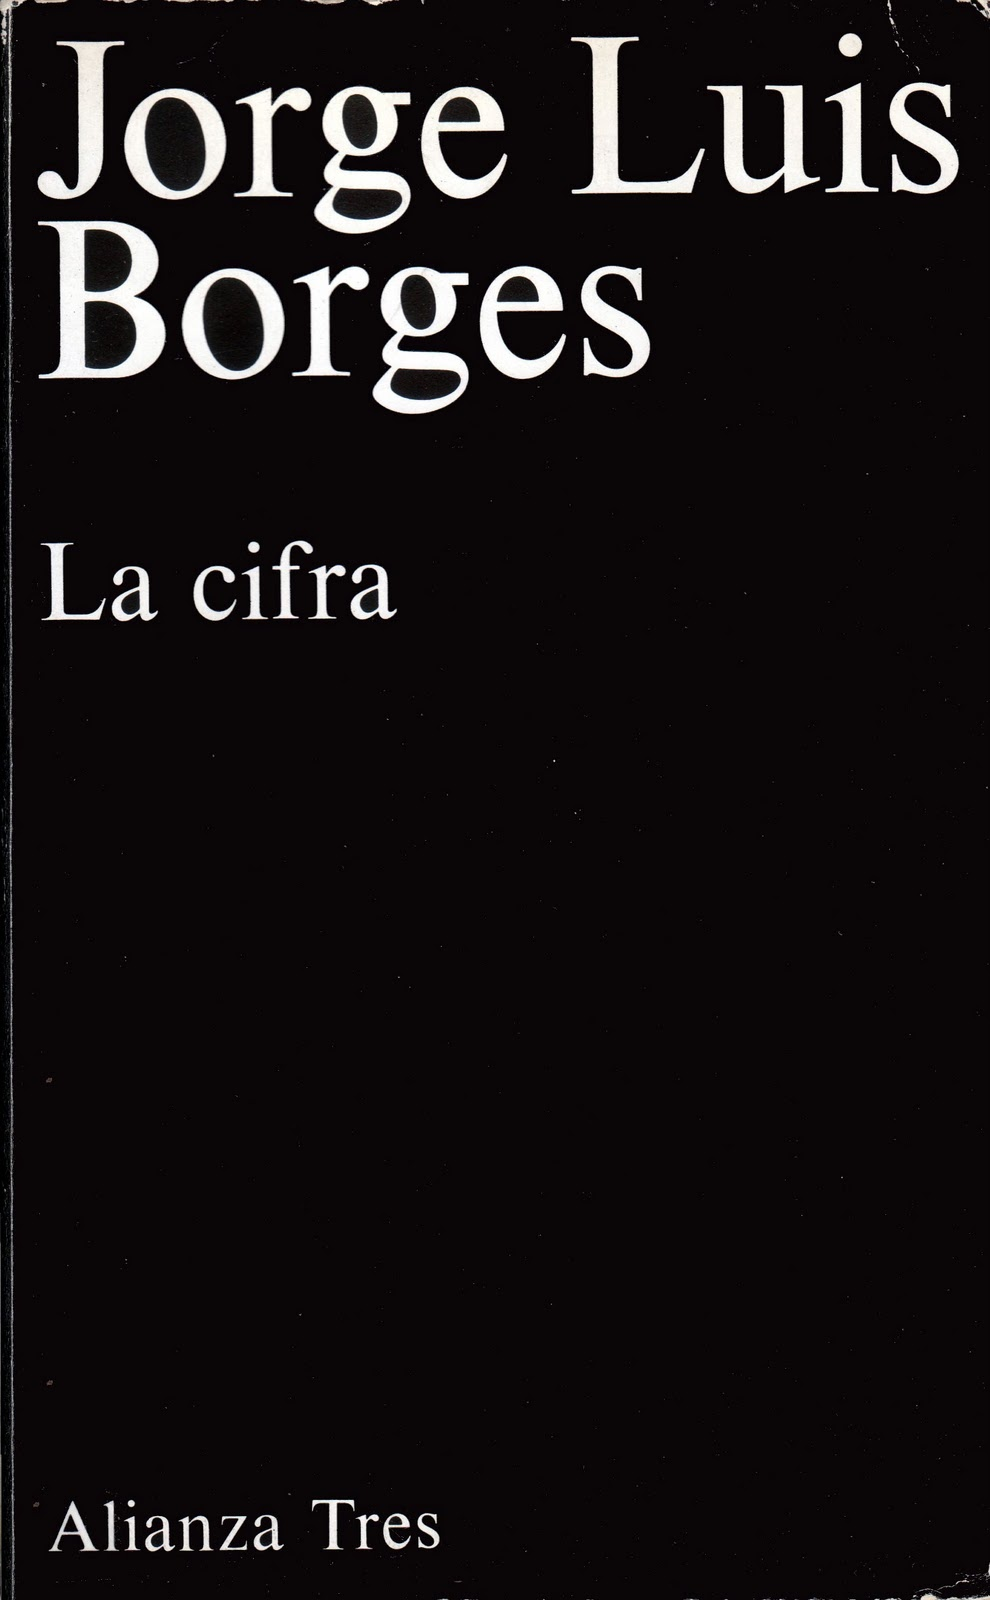 Documenta minima: LA CIFRA, Jorge Luis Borges